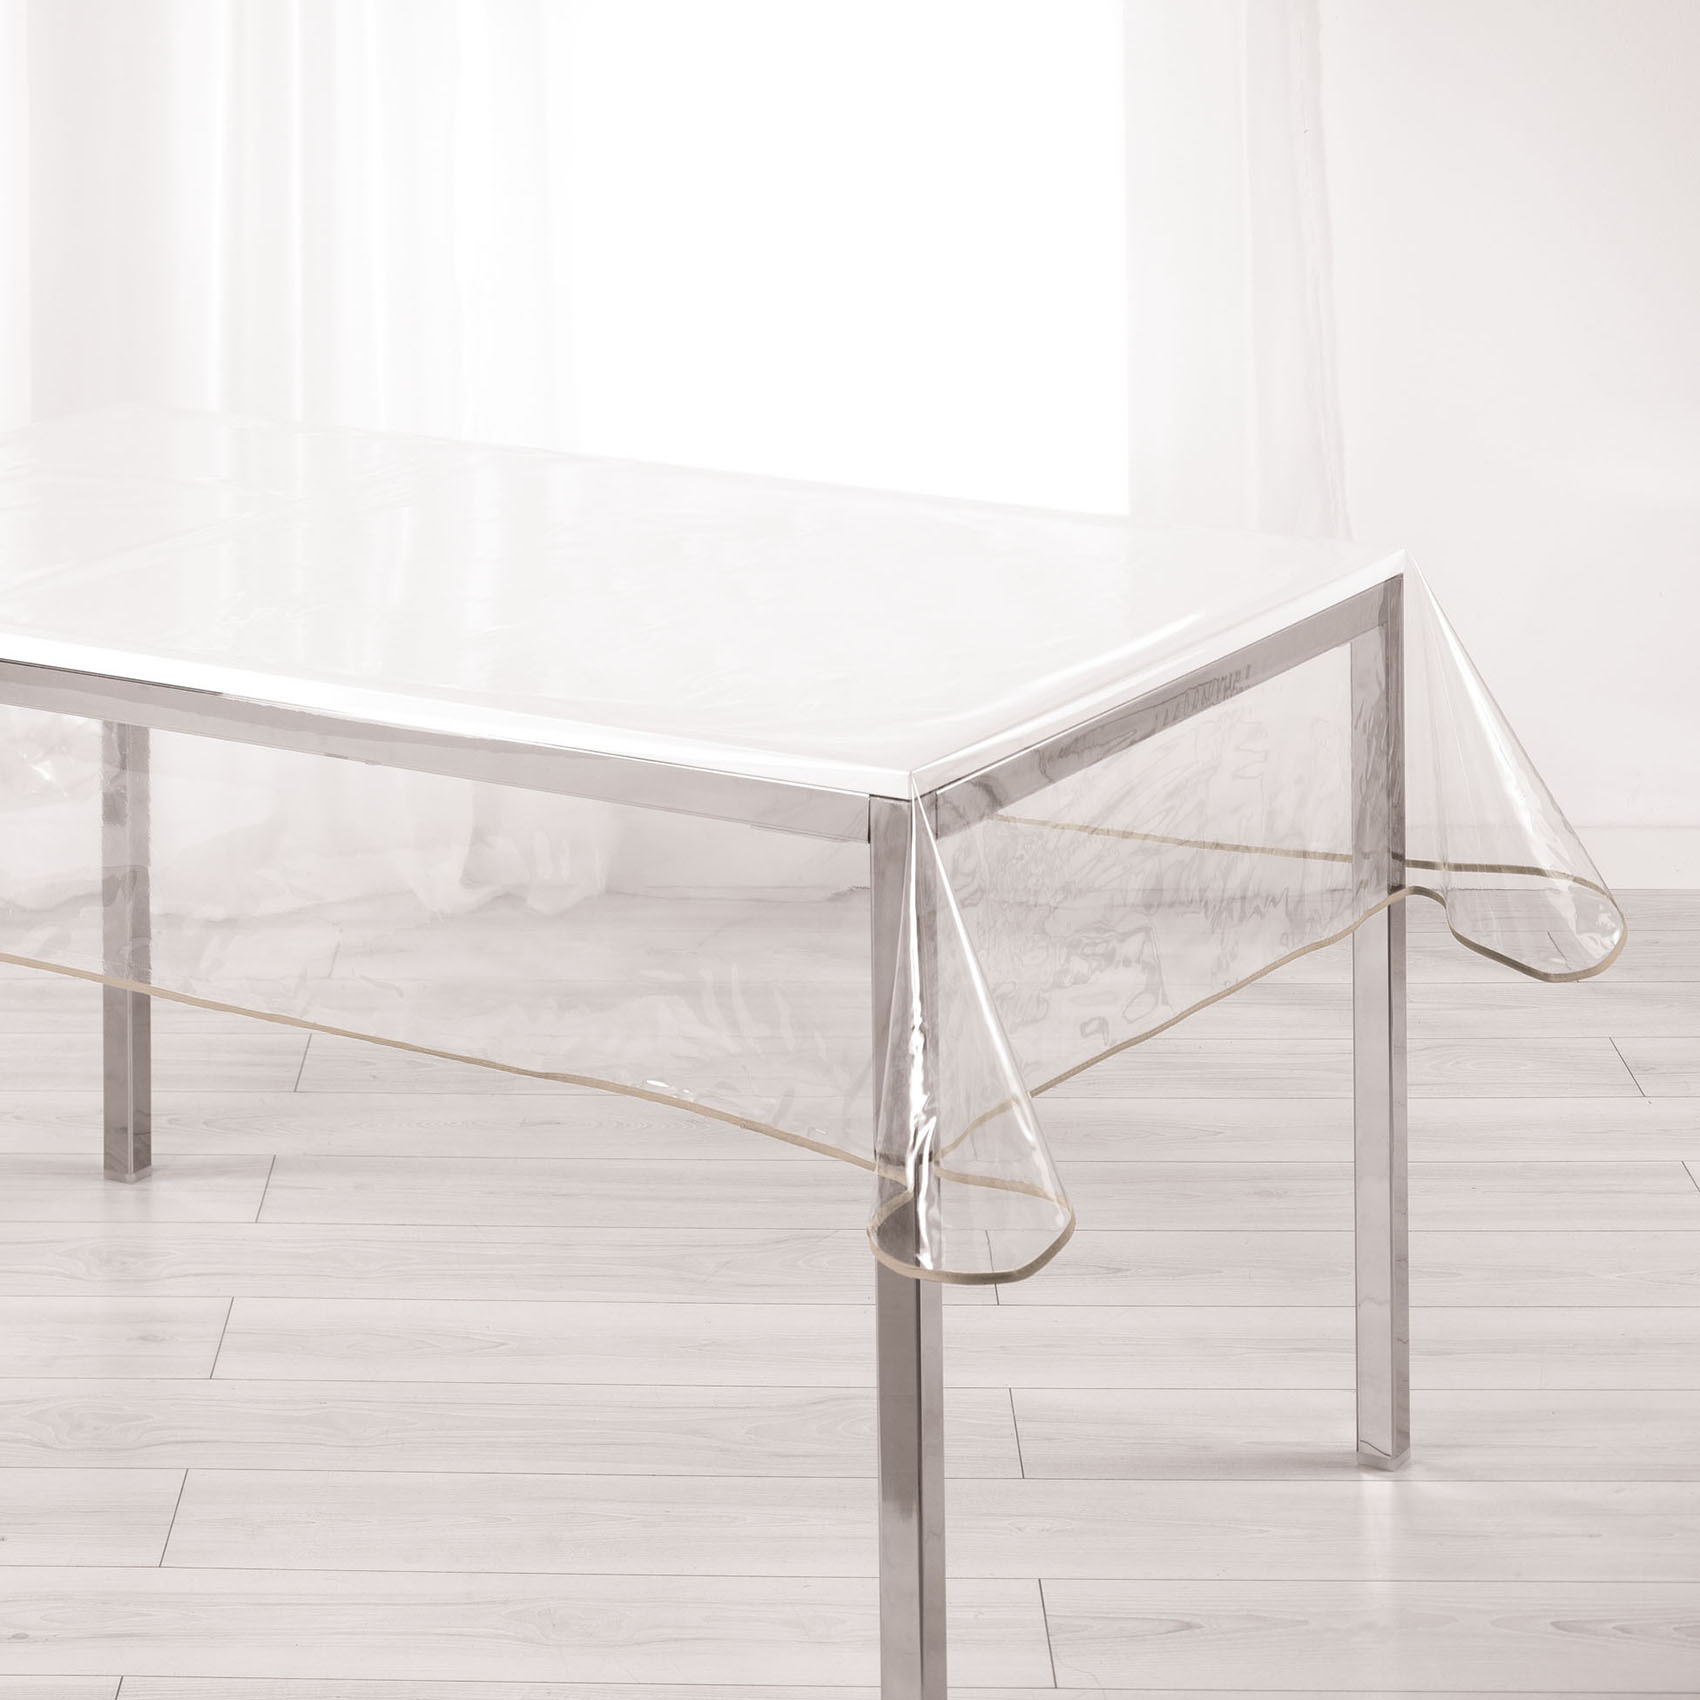 Nappe rectangulaire finition biais coloré polyester taupe 240x140